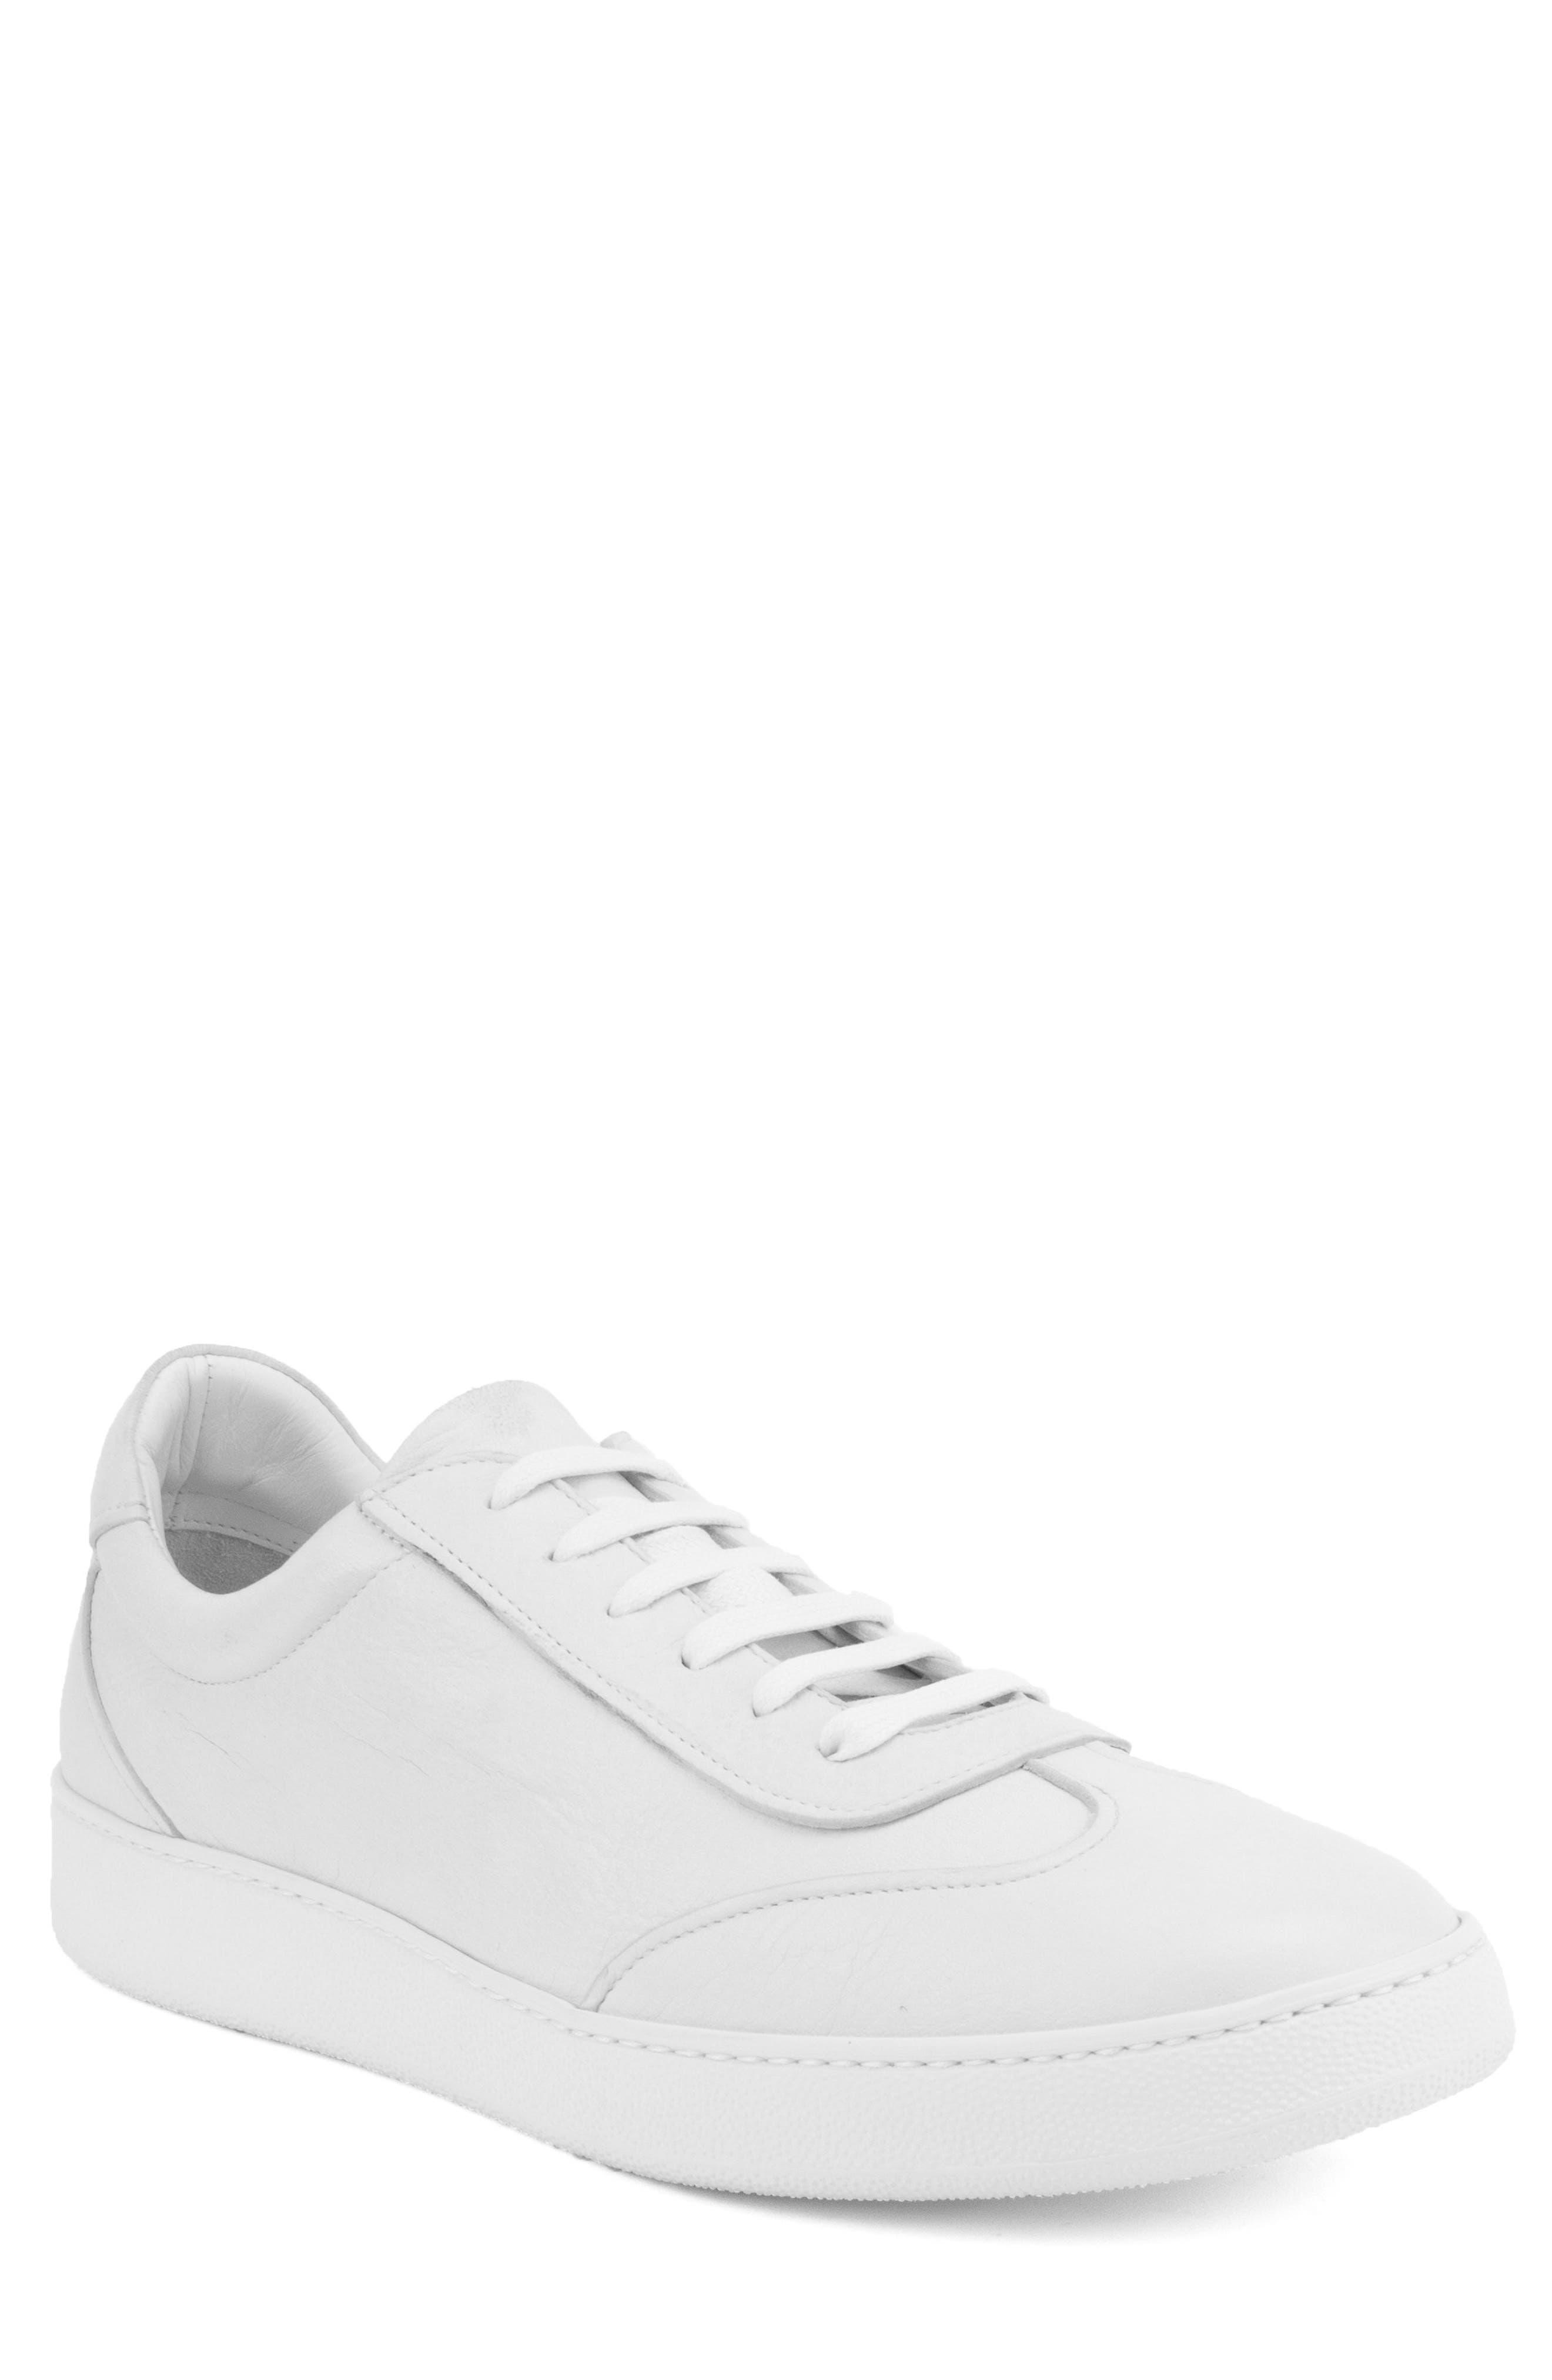 Tristan Sneaker,                         Main,                         color, WHITE LEATHER